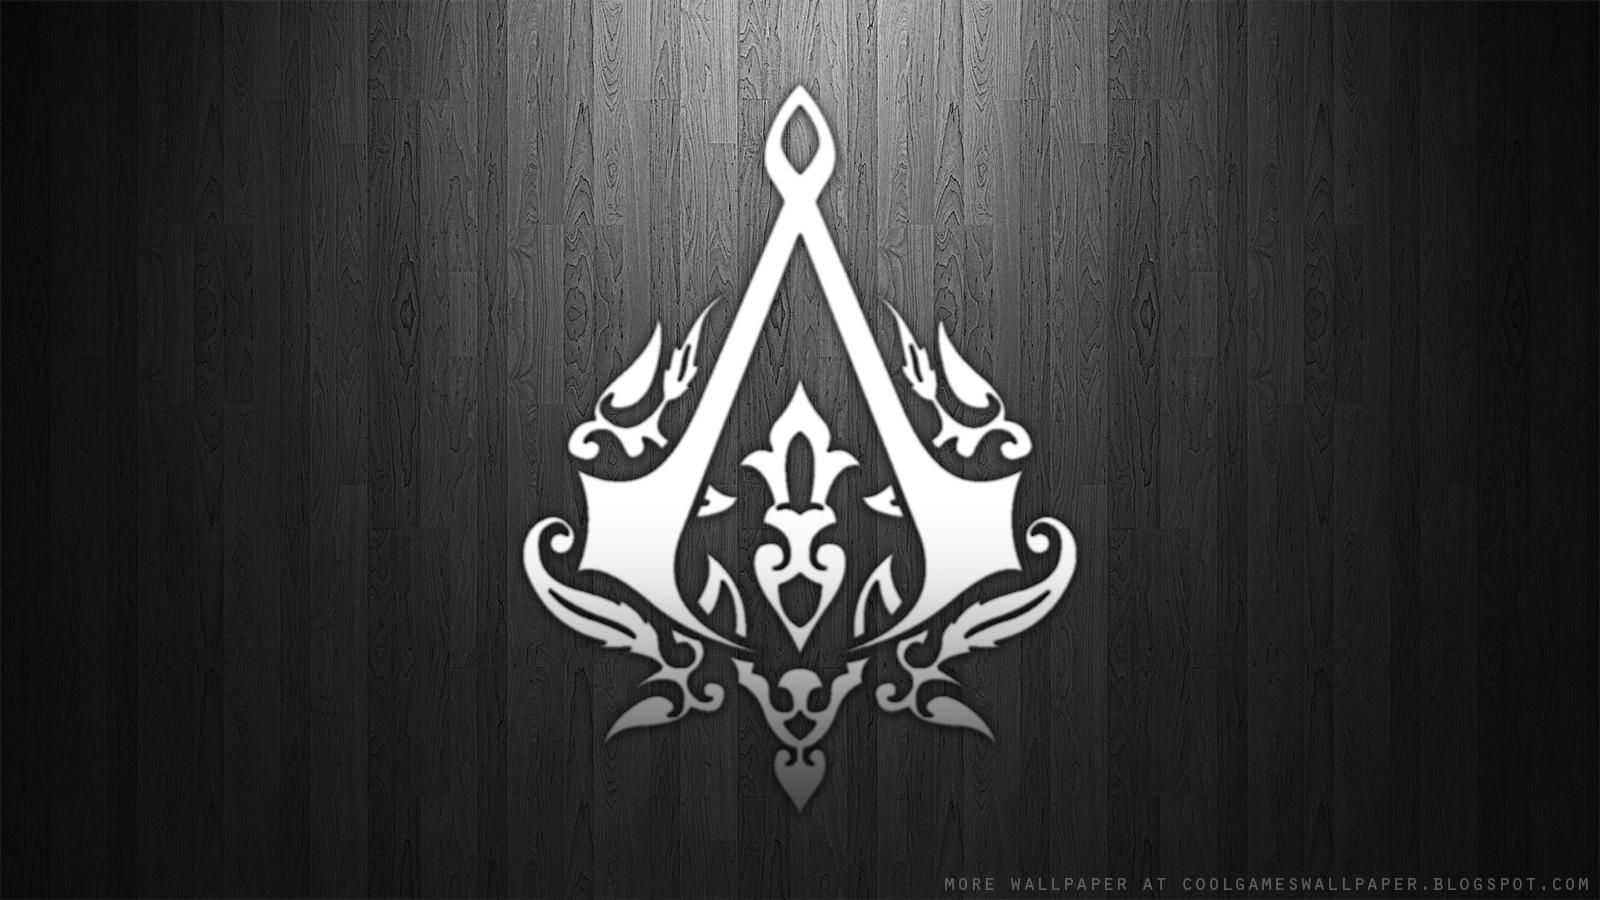 Assassins Creed 3 Logo Wallpaper   Cool Games Wallpaper 1600x900